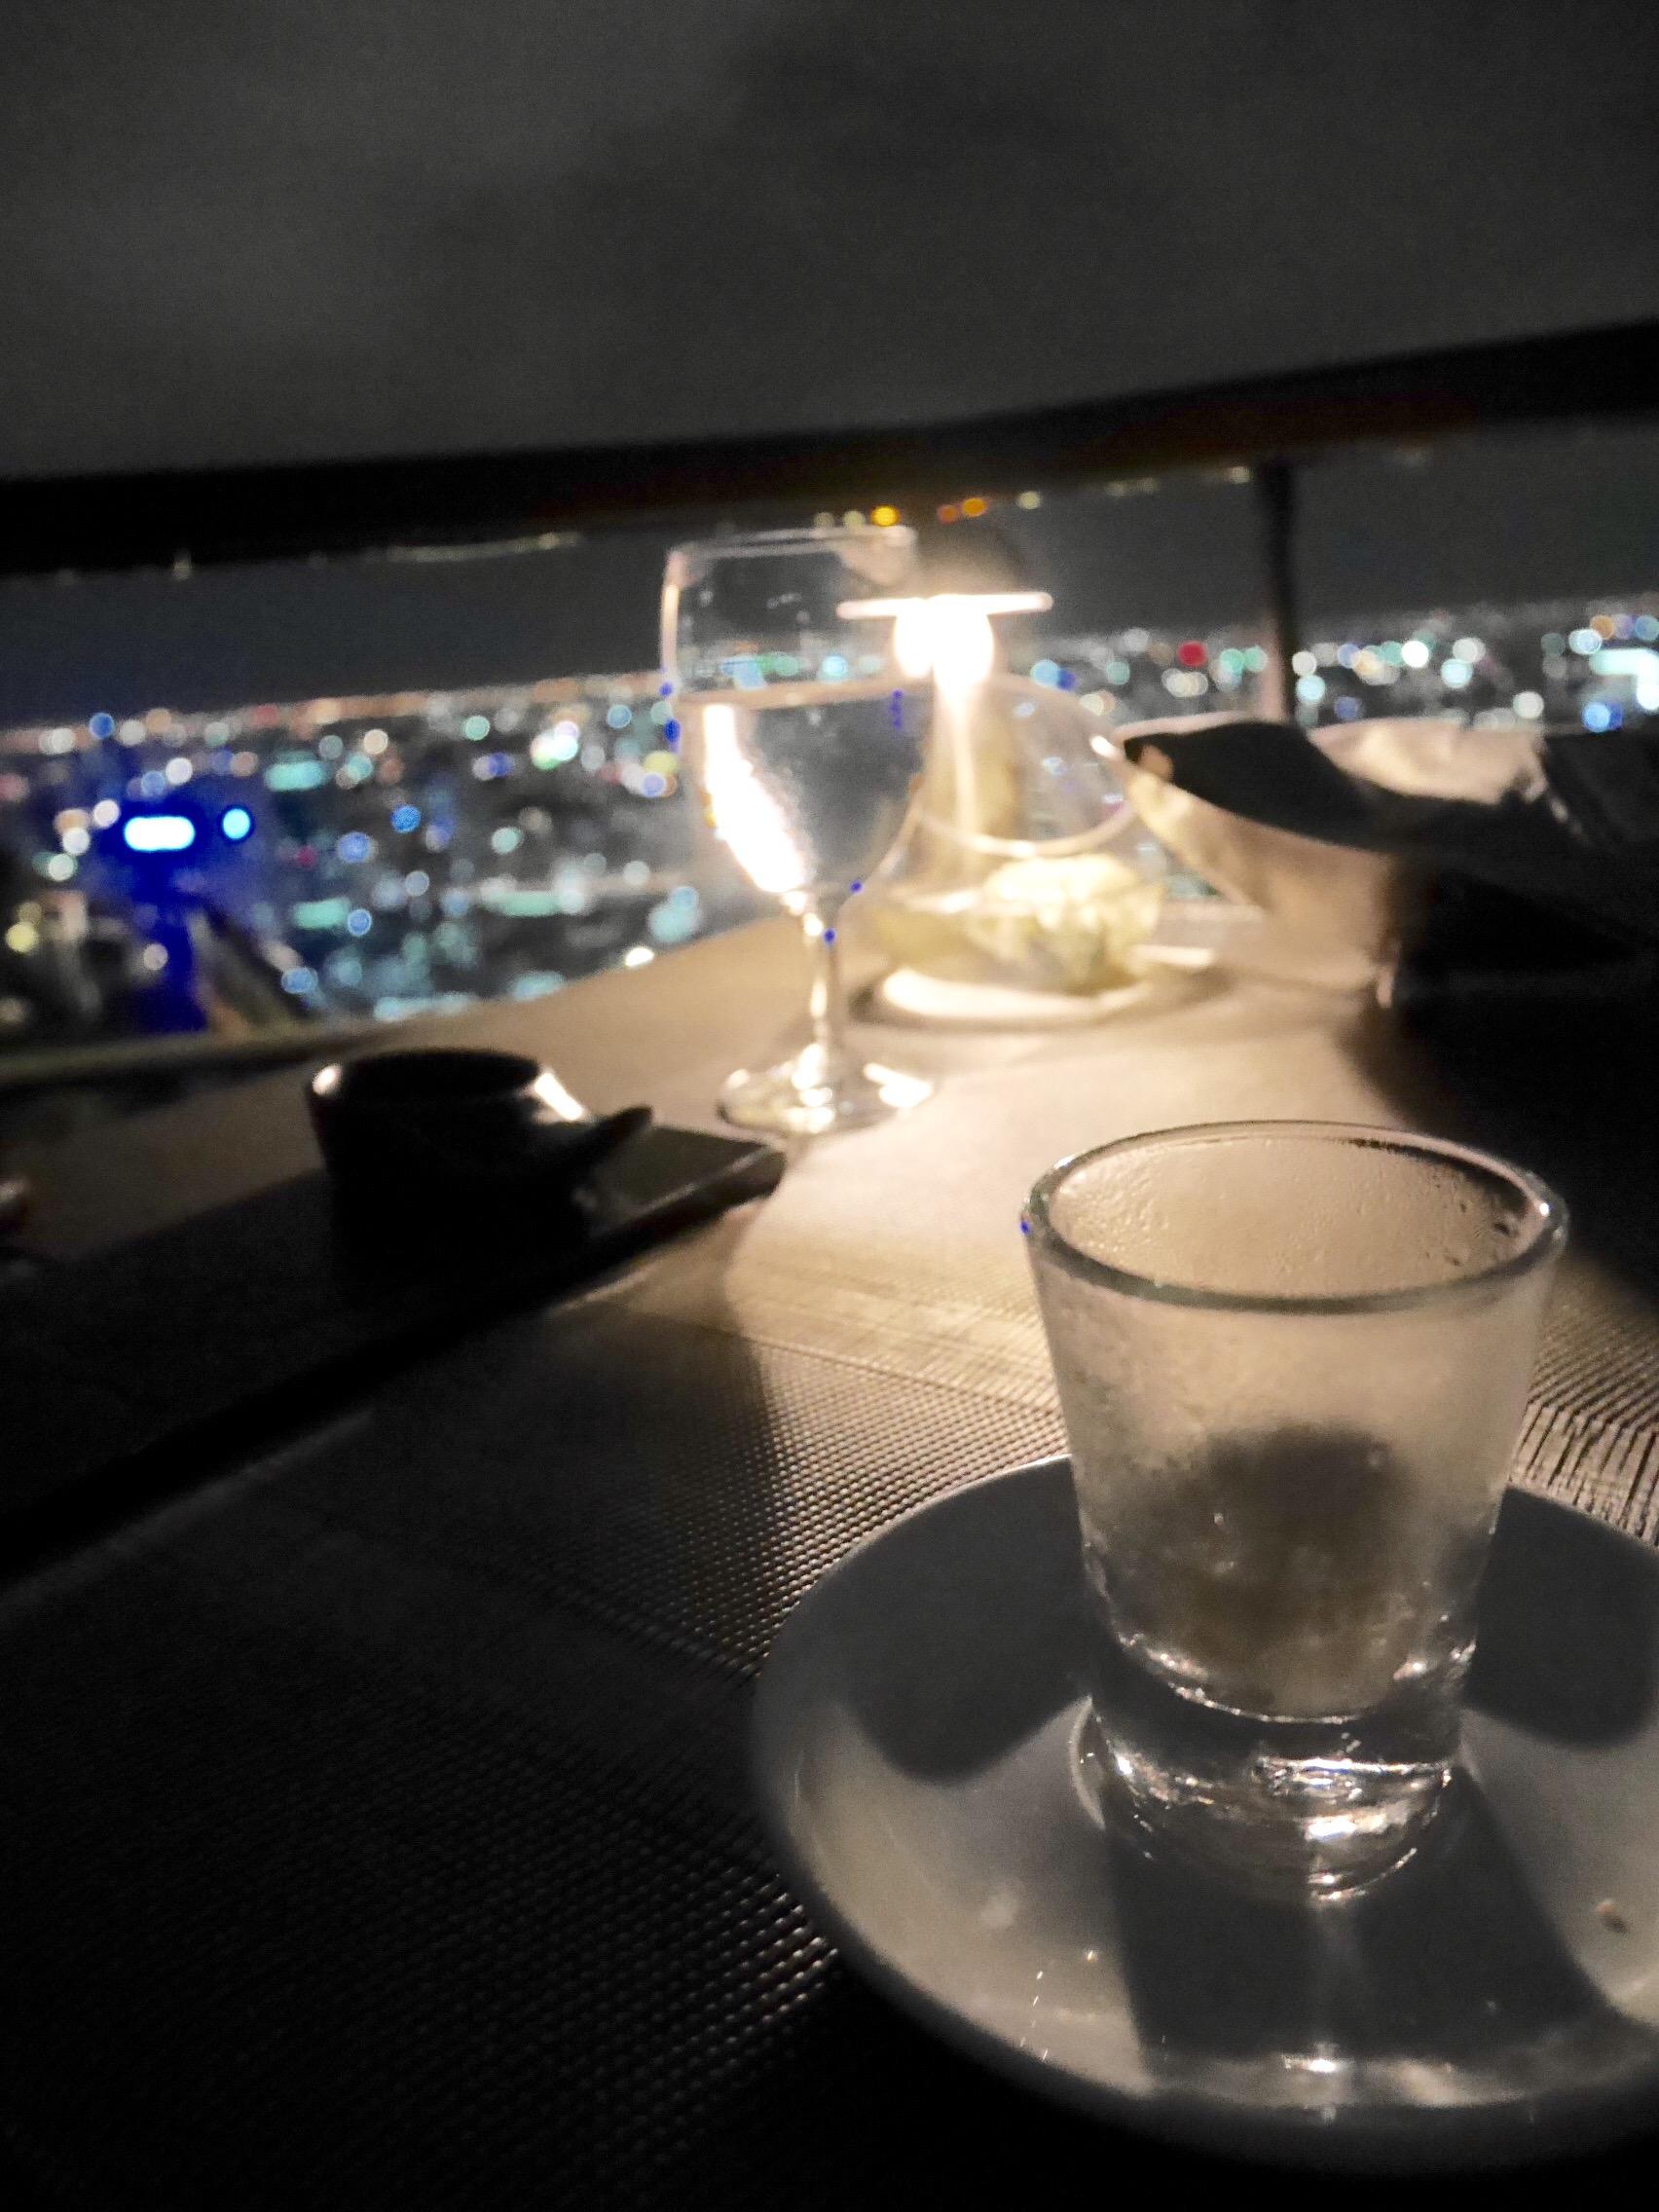 img 8304 - Banyan Tree Bangkok - 61階のルーフトップレストランVertigoで過ごす贅沢ディナータイム